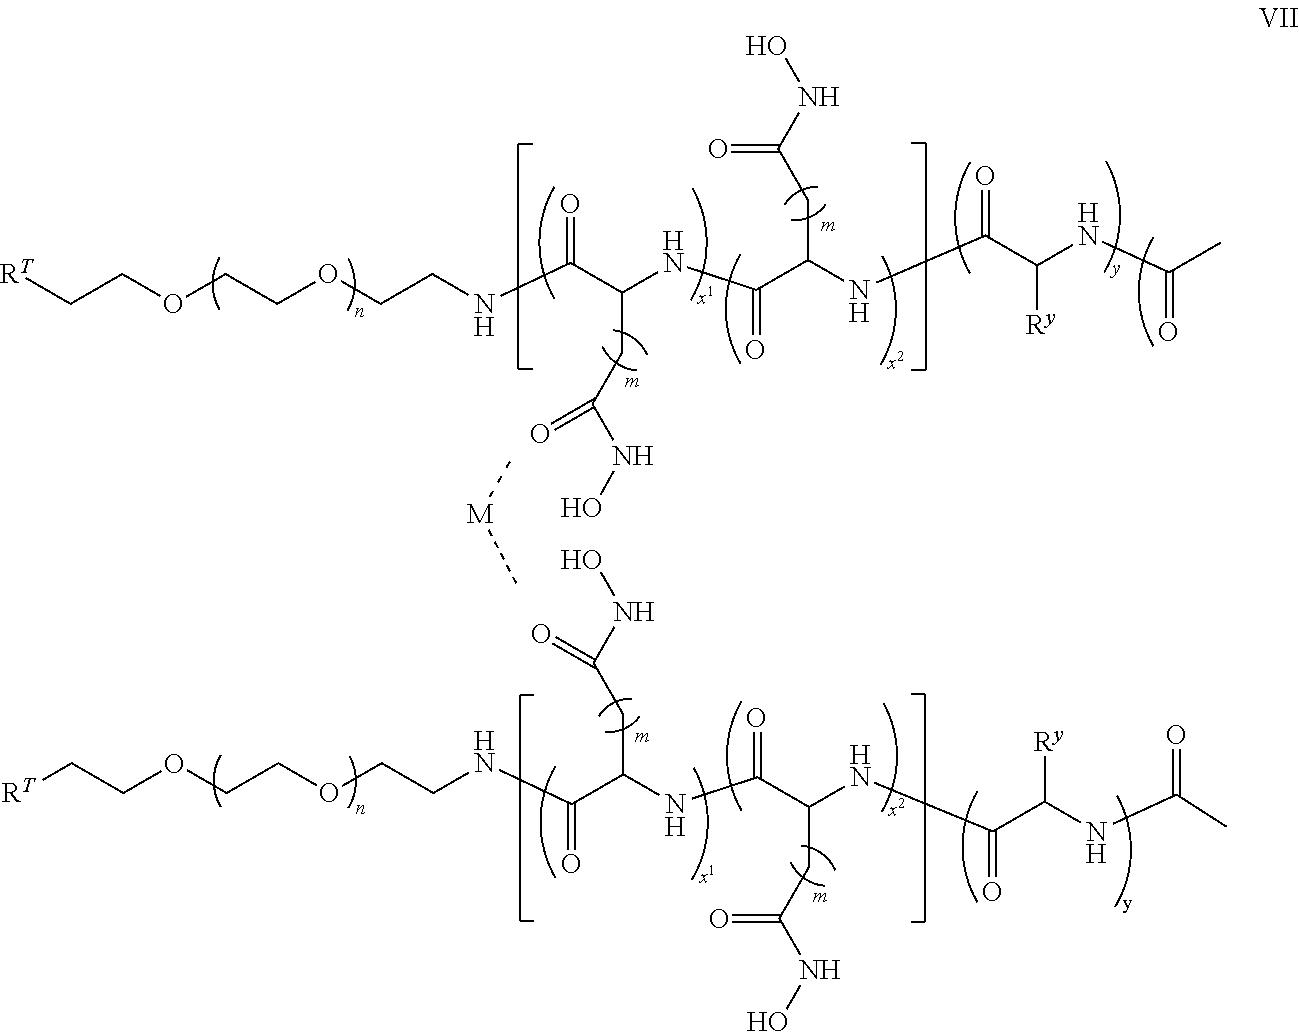 metformin non diabetic use